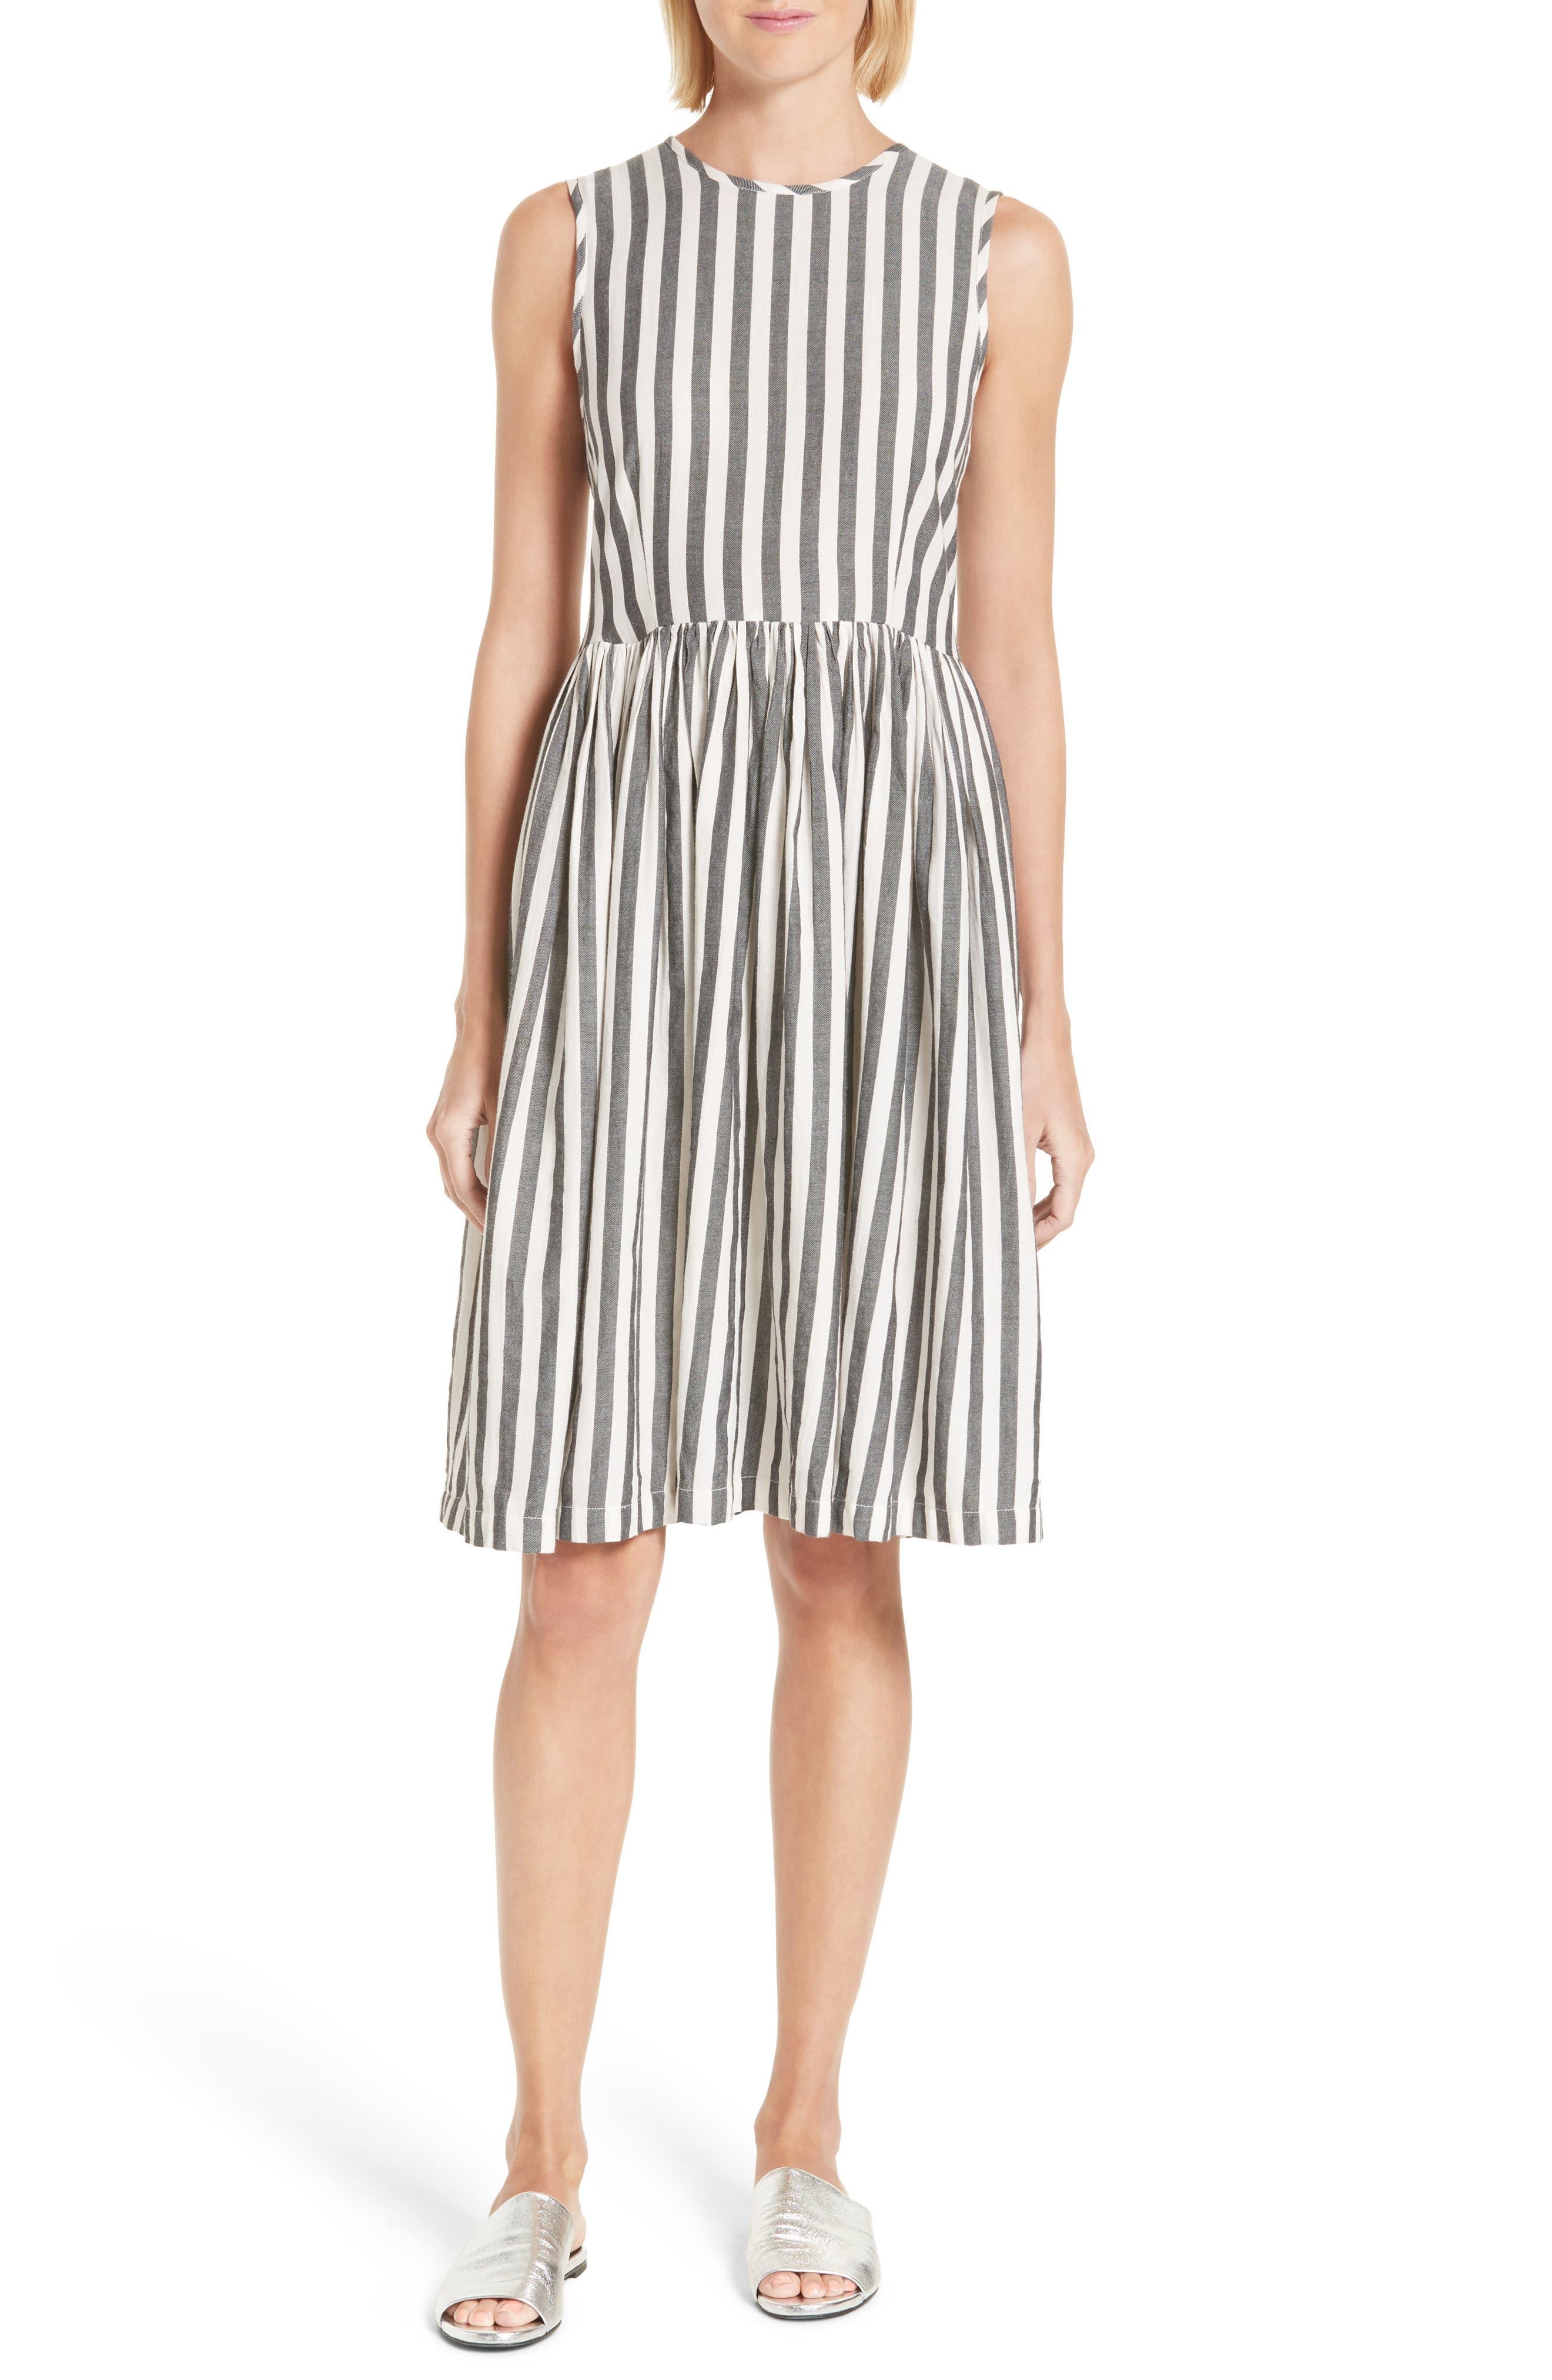 The Prairie Stripe Dress,                         Main,                         color, Black And White Stripe